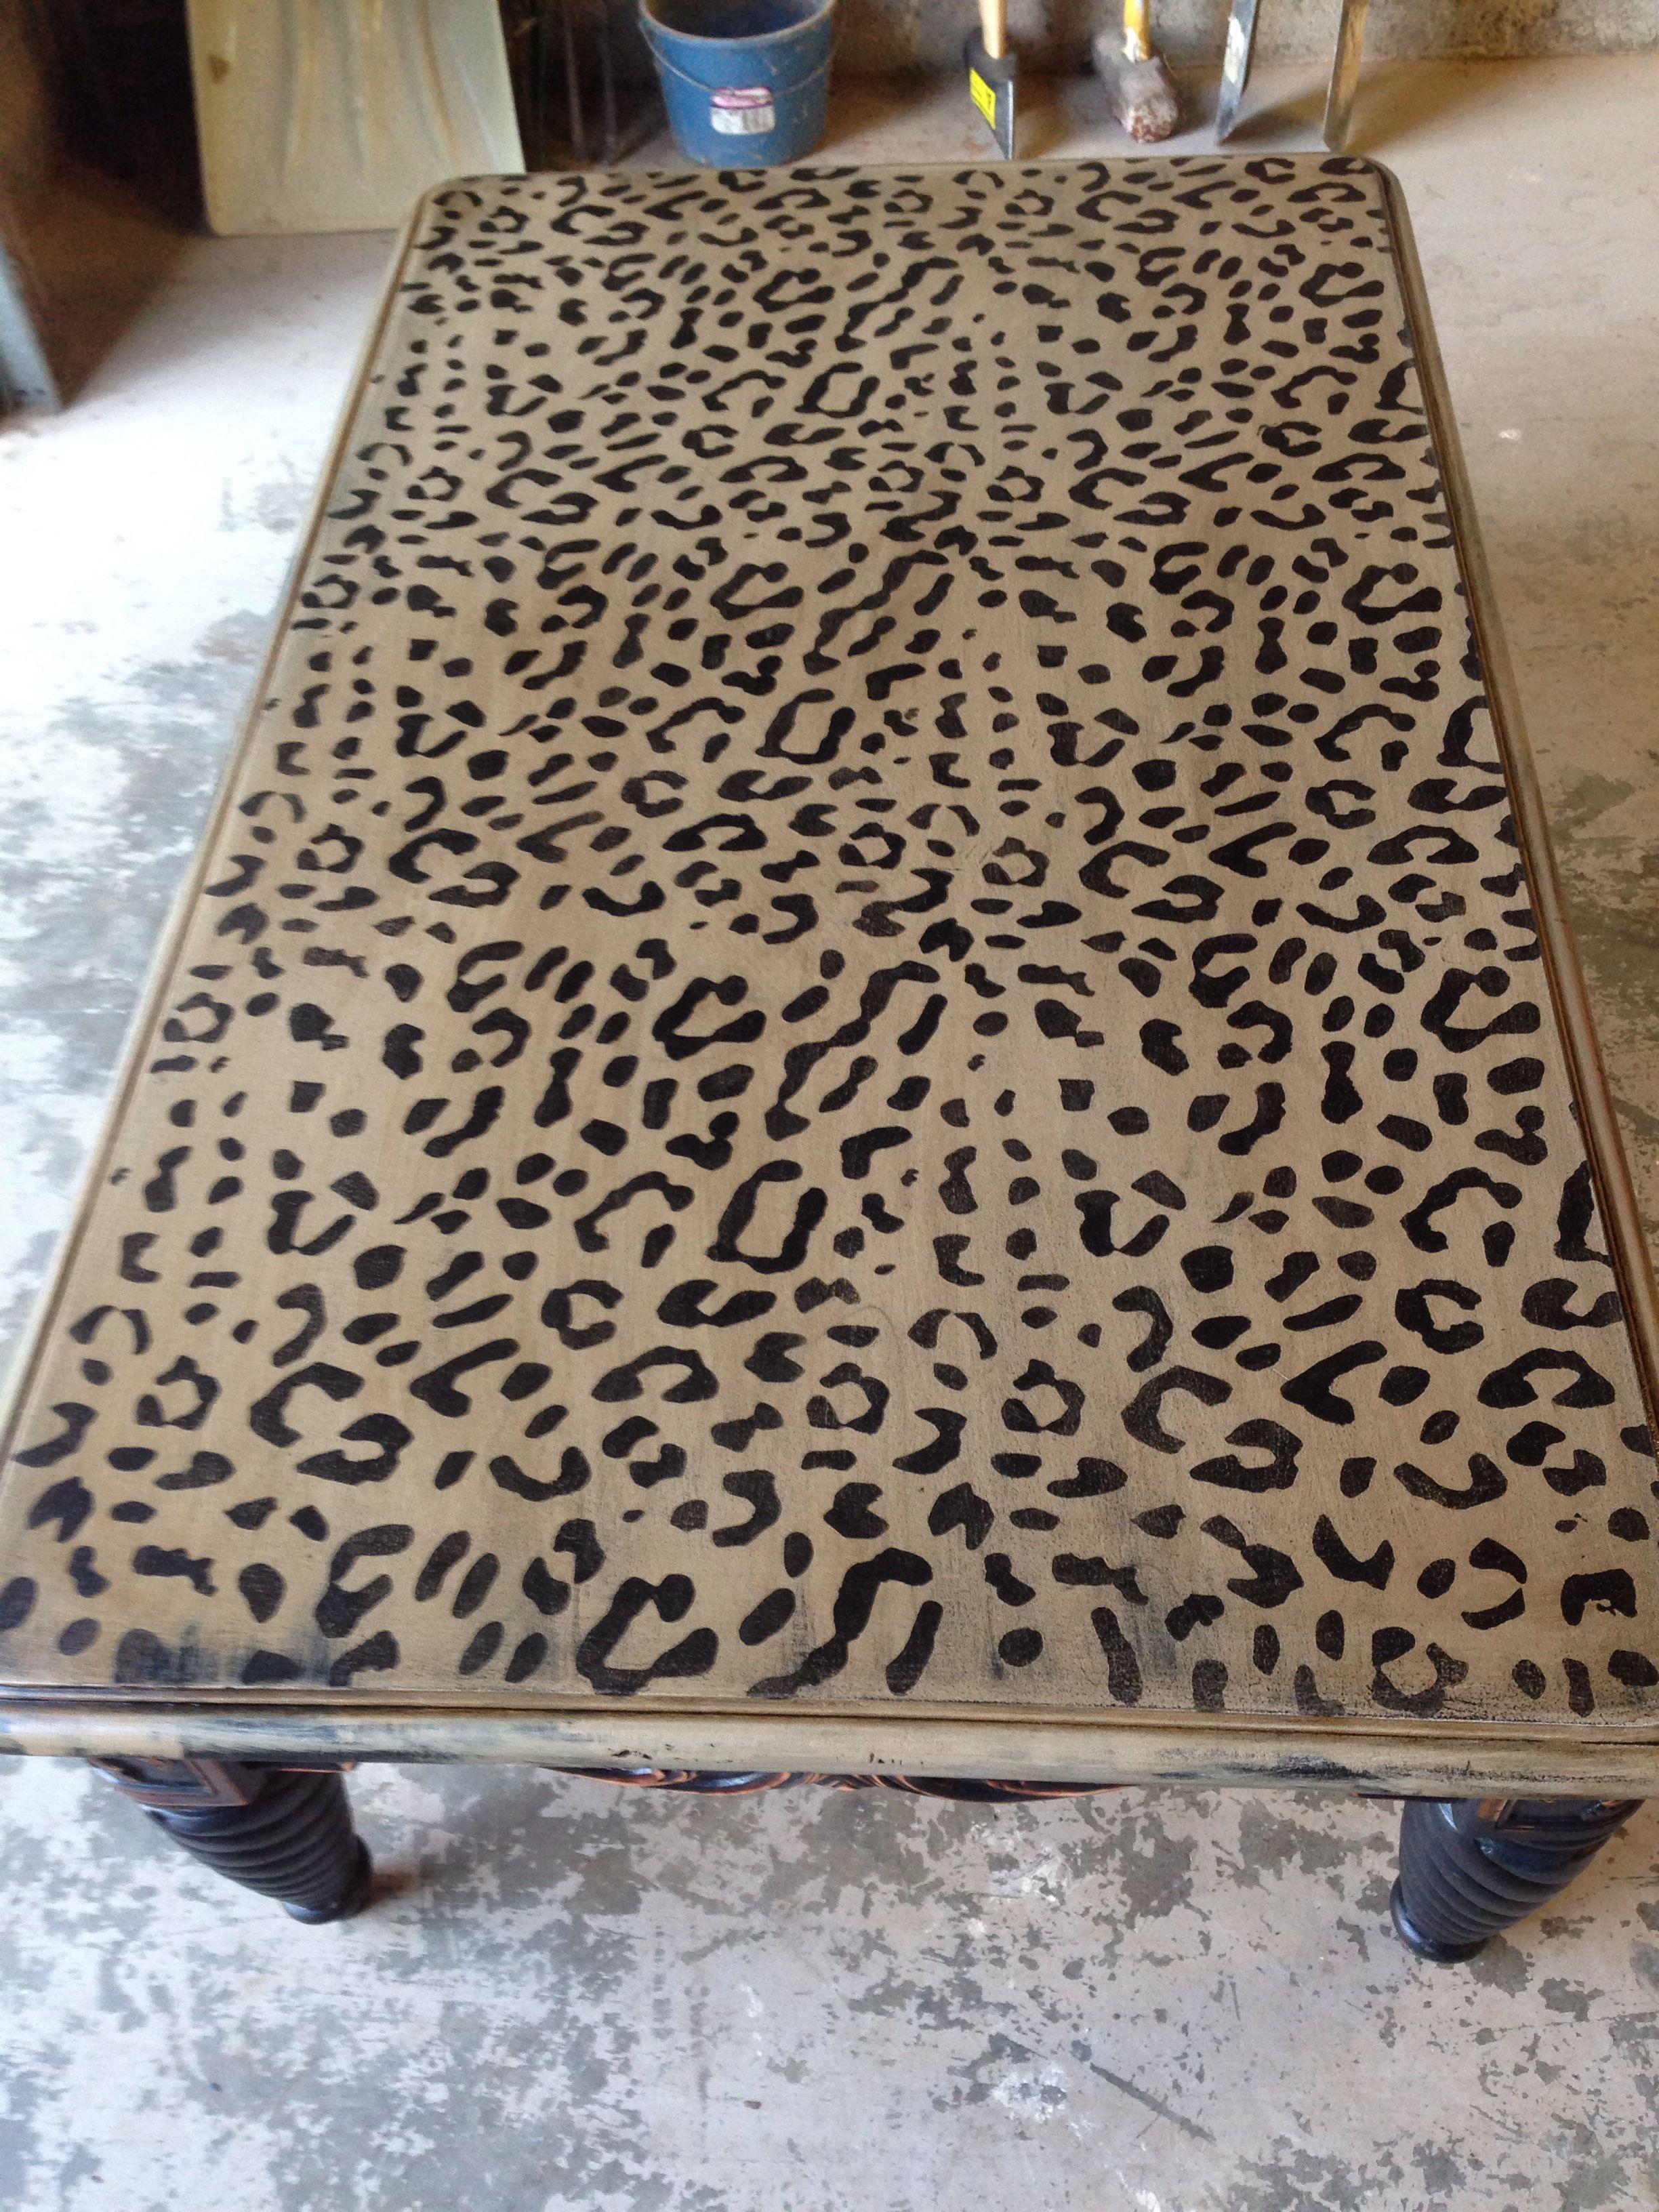 Leopard print coffee table. | My Handiwork in 2019 ...